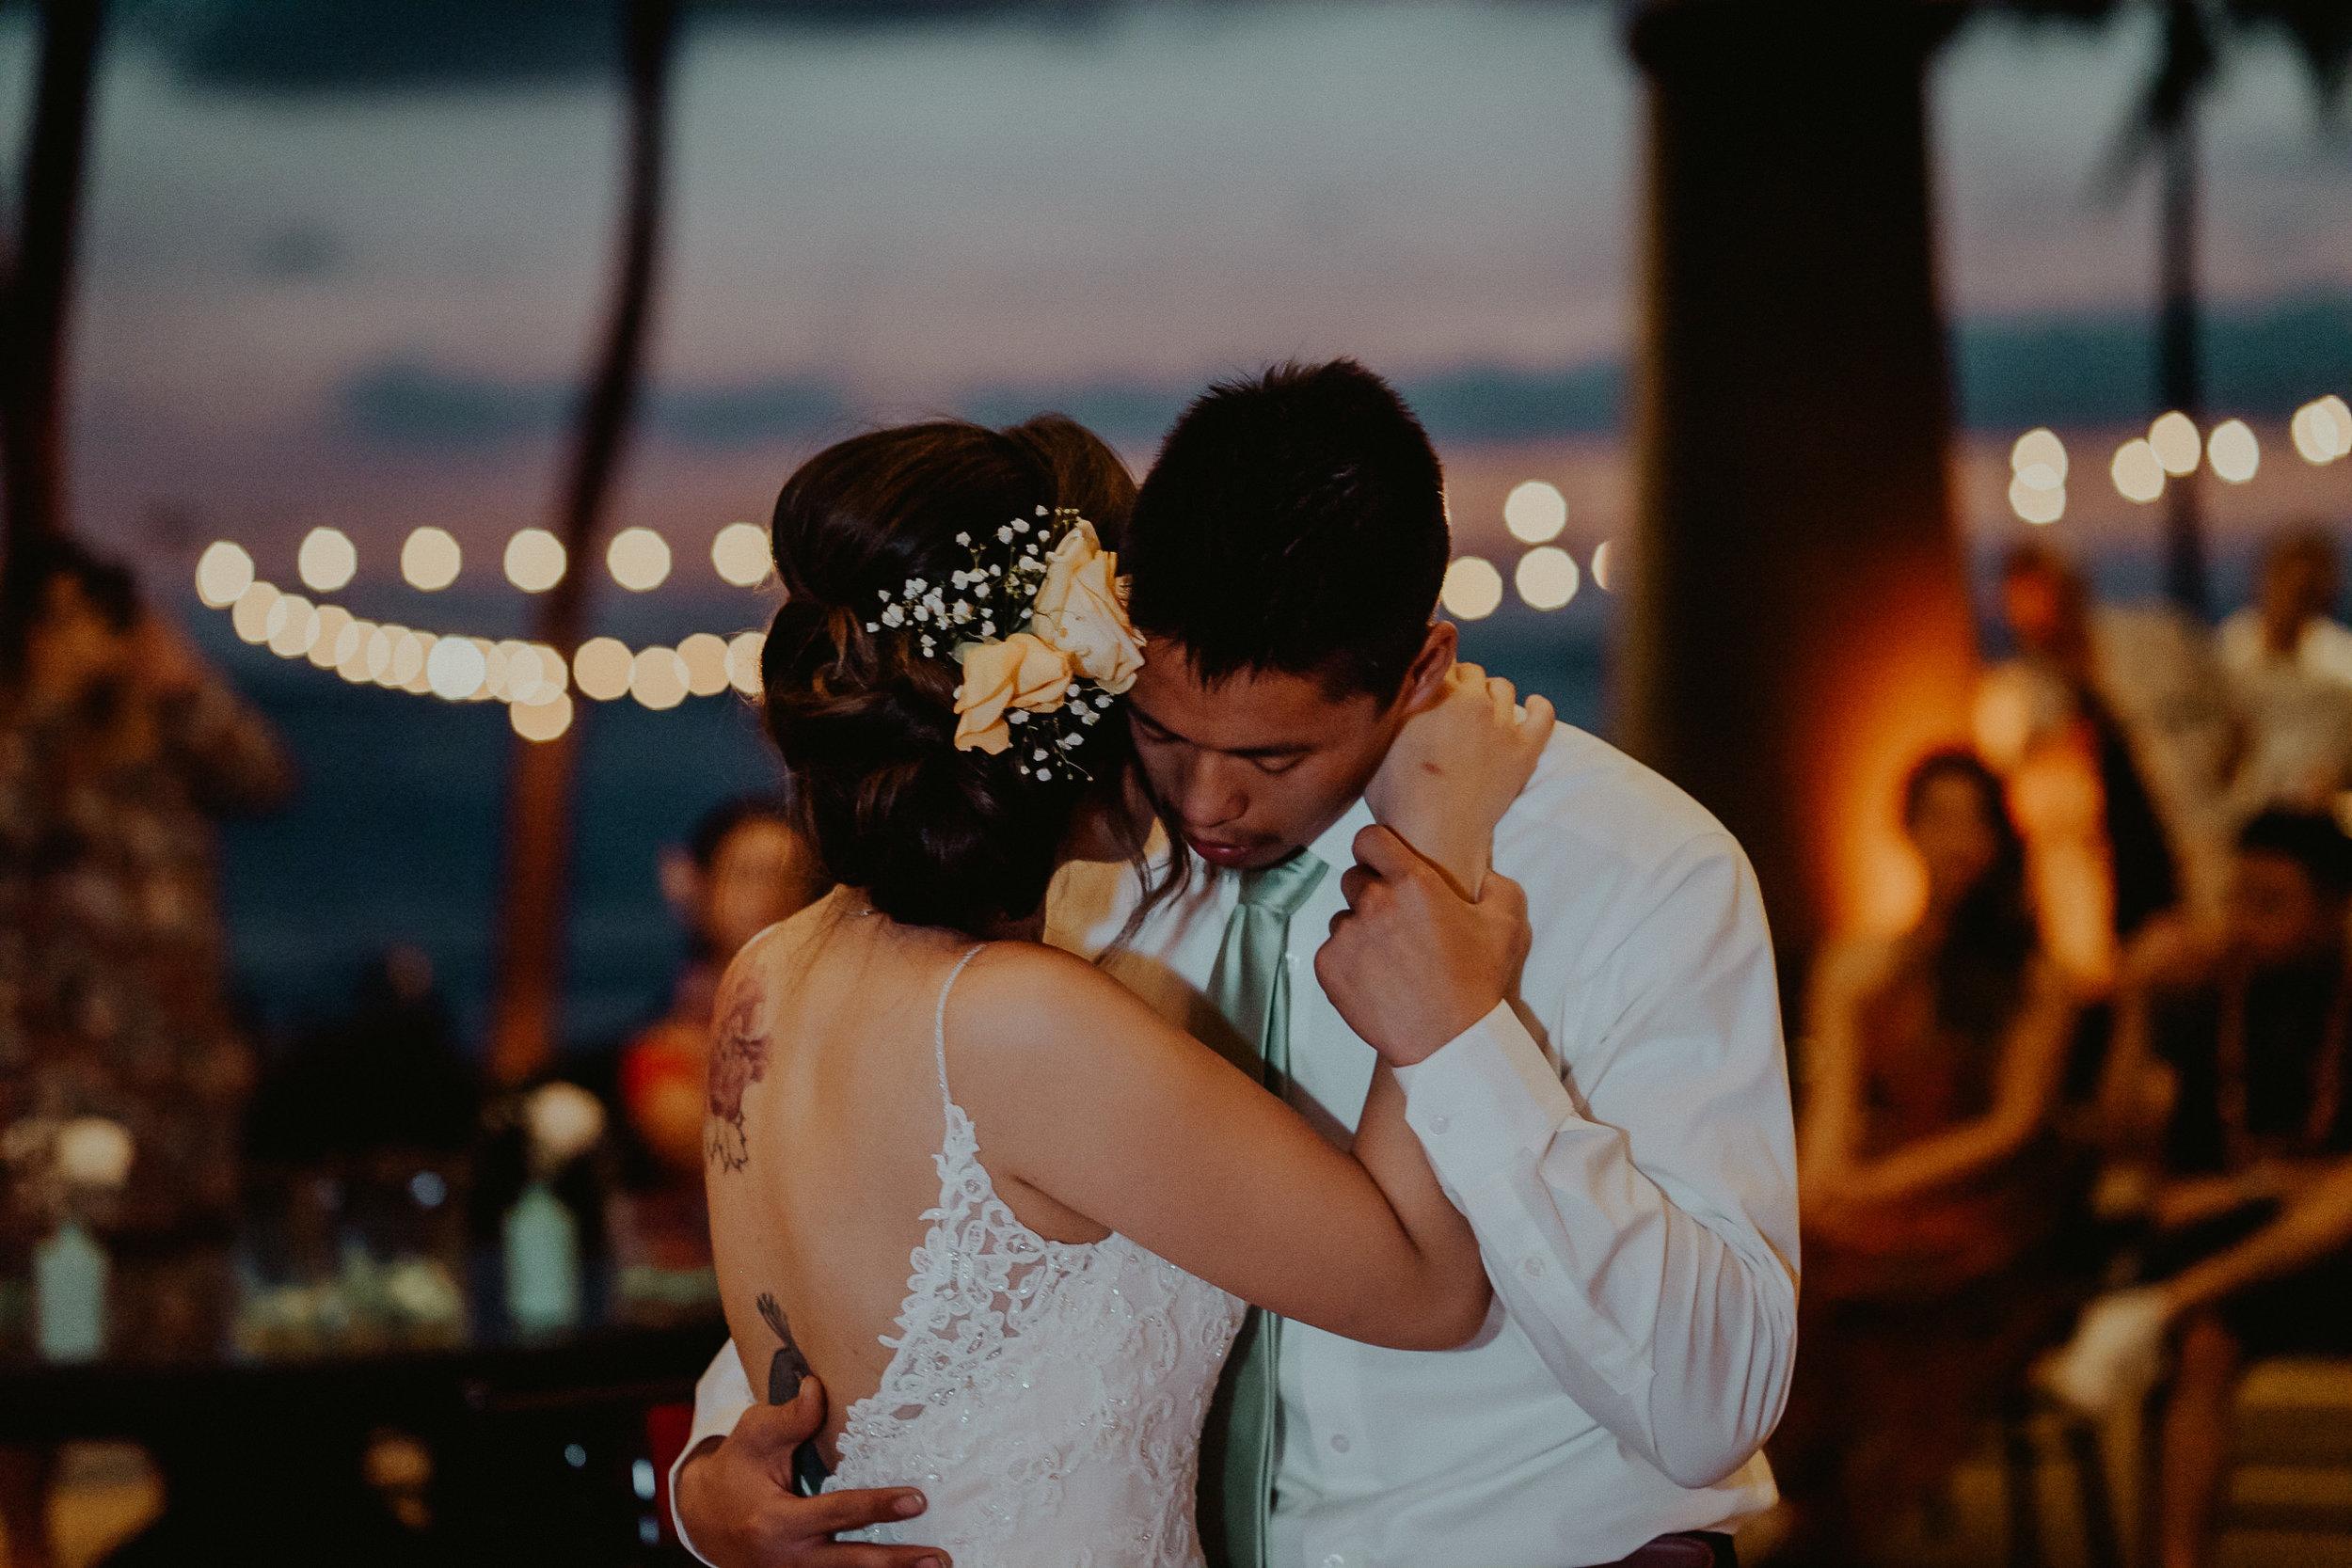 Maui_Destination_wedding_Alfred_Tang-81.jpg